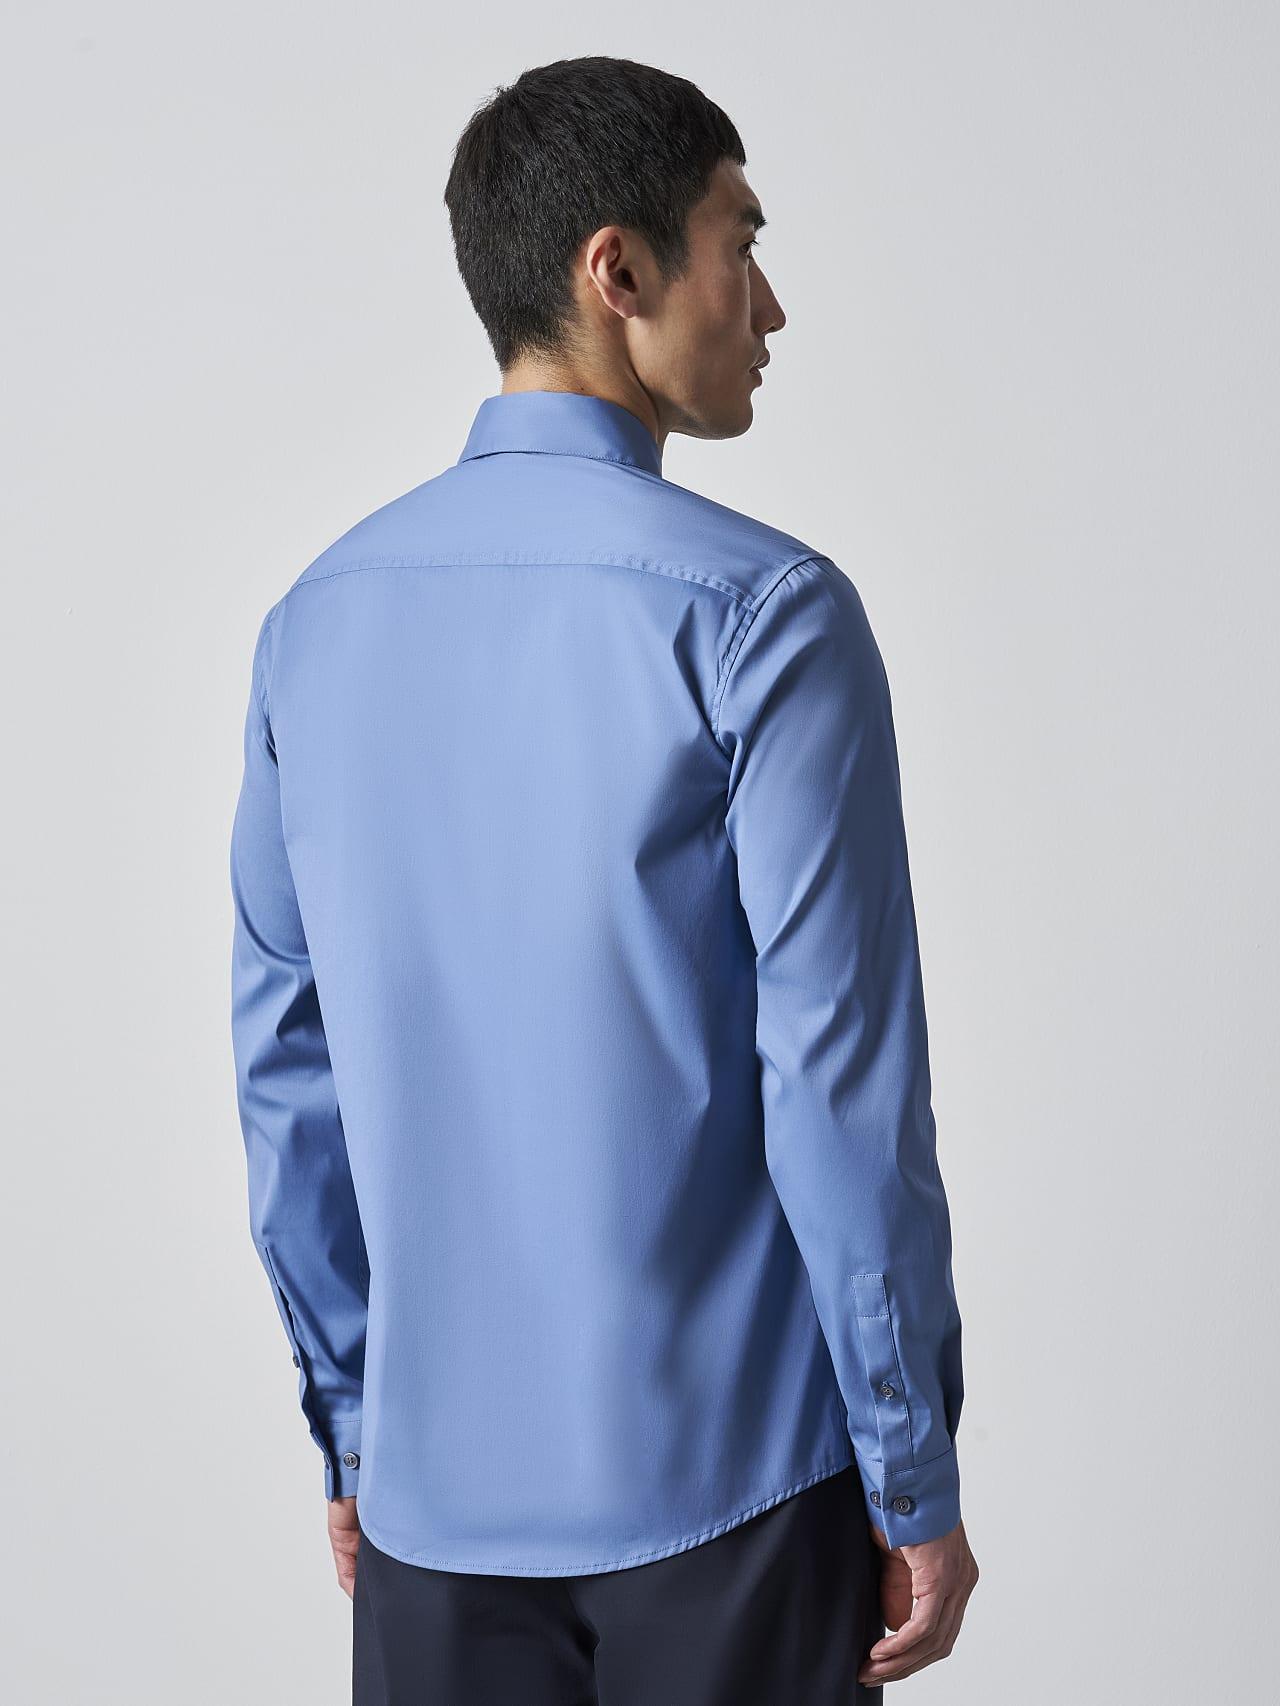 WAARG V2.Y5.02 Easy-Care Cotton Shirt light blue Front Main Alpha Tauri